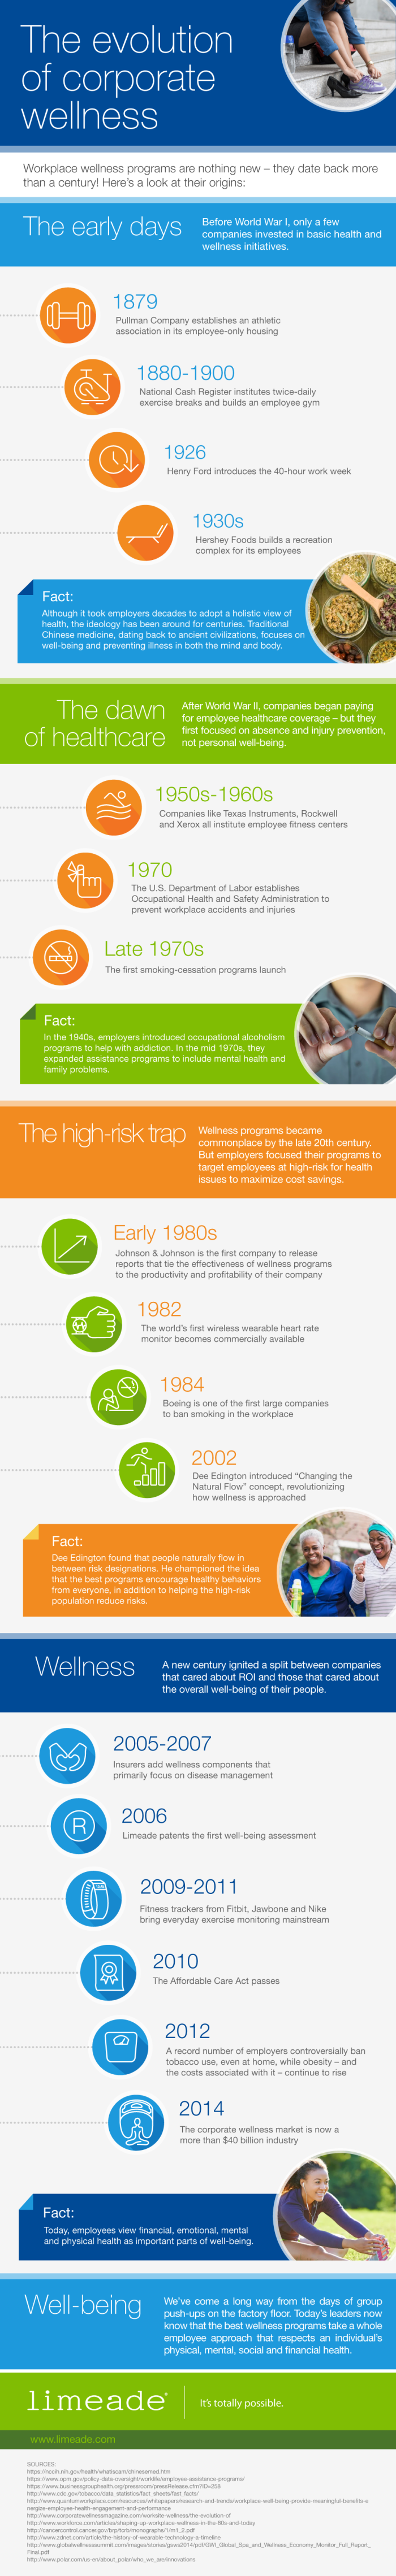 Limeade-evolution-of-corporate-wellness_972px